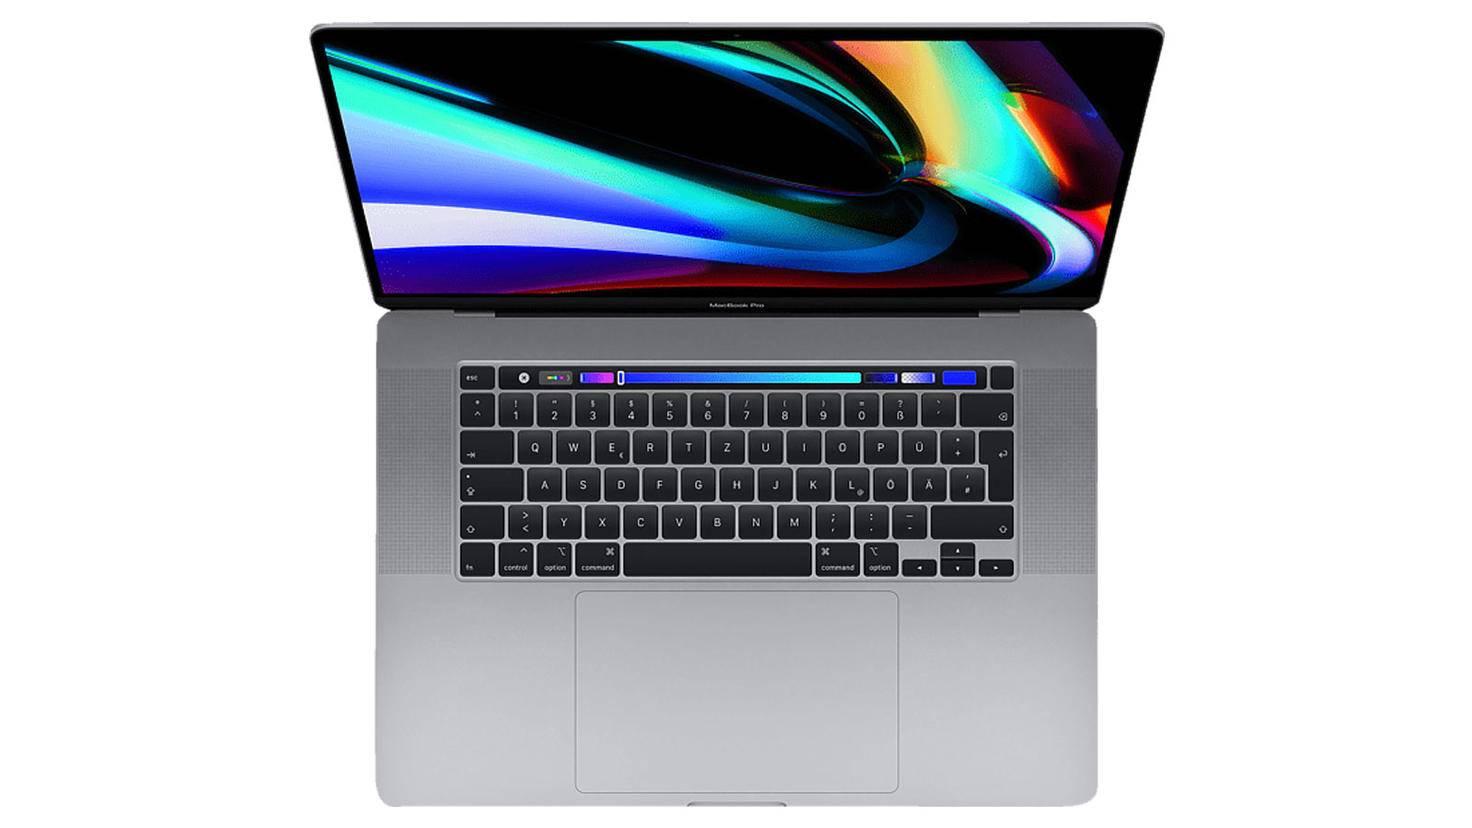 Apple MVVJ2D/A MacBook Pro